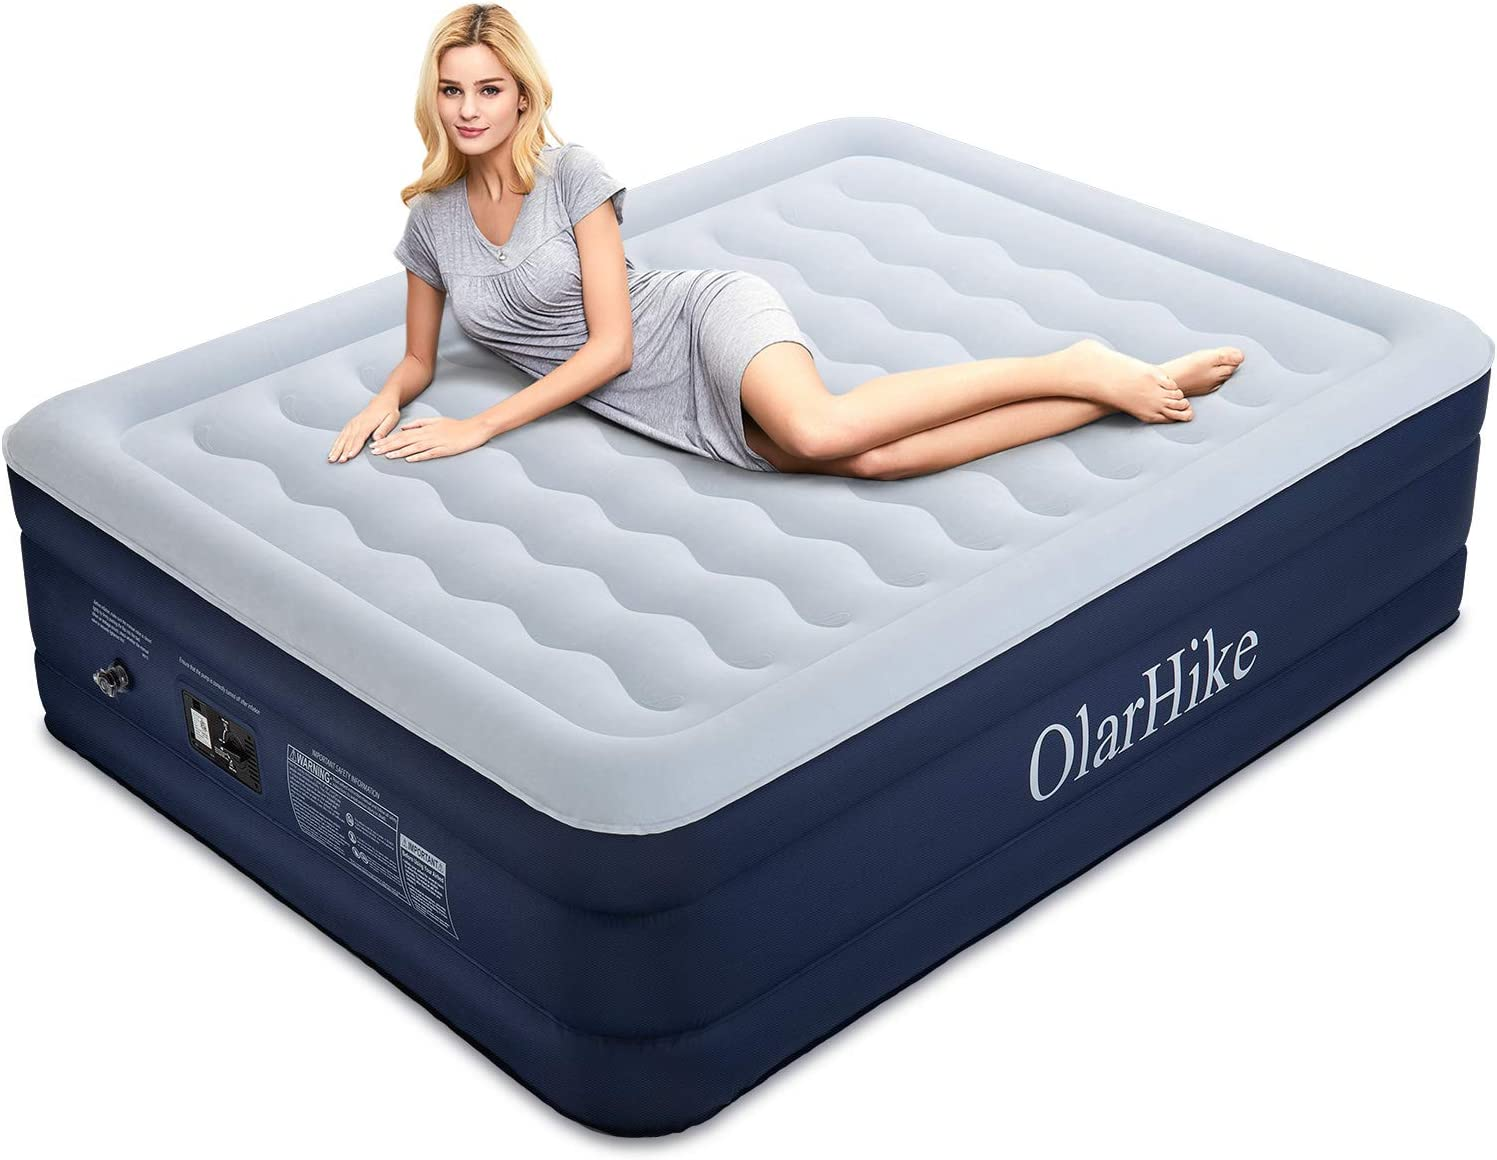 Amazon.com: Colchón de aire OlarHike con bomba incorporada ...